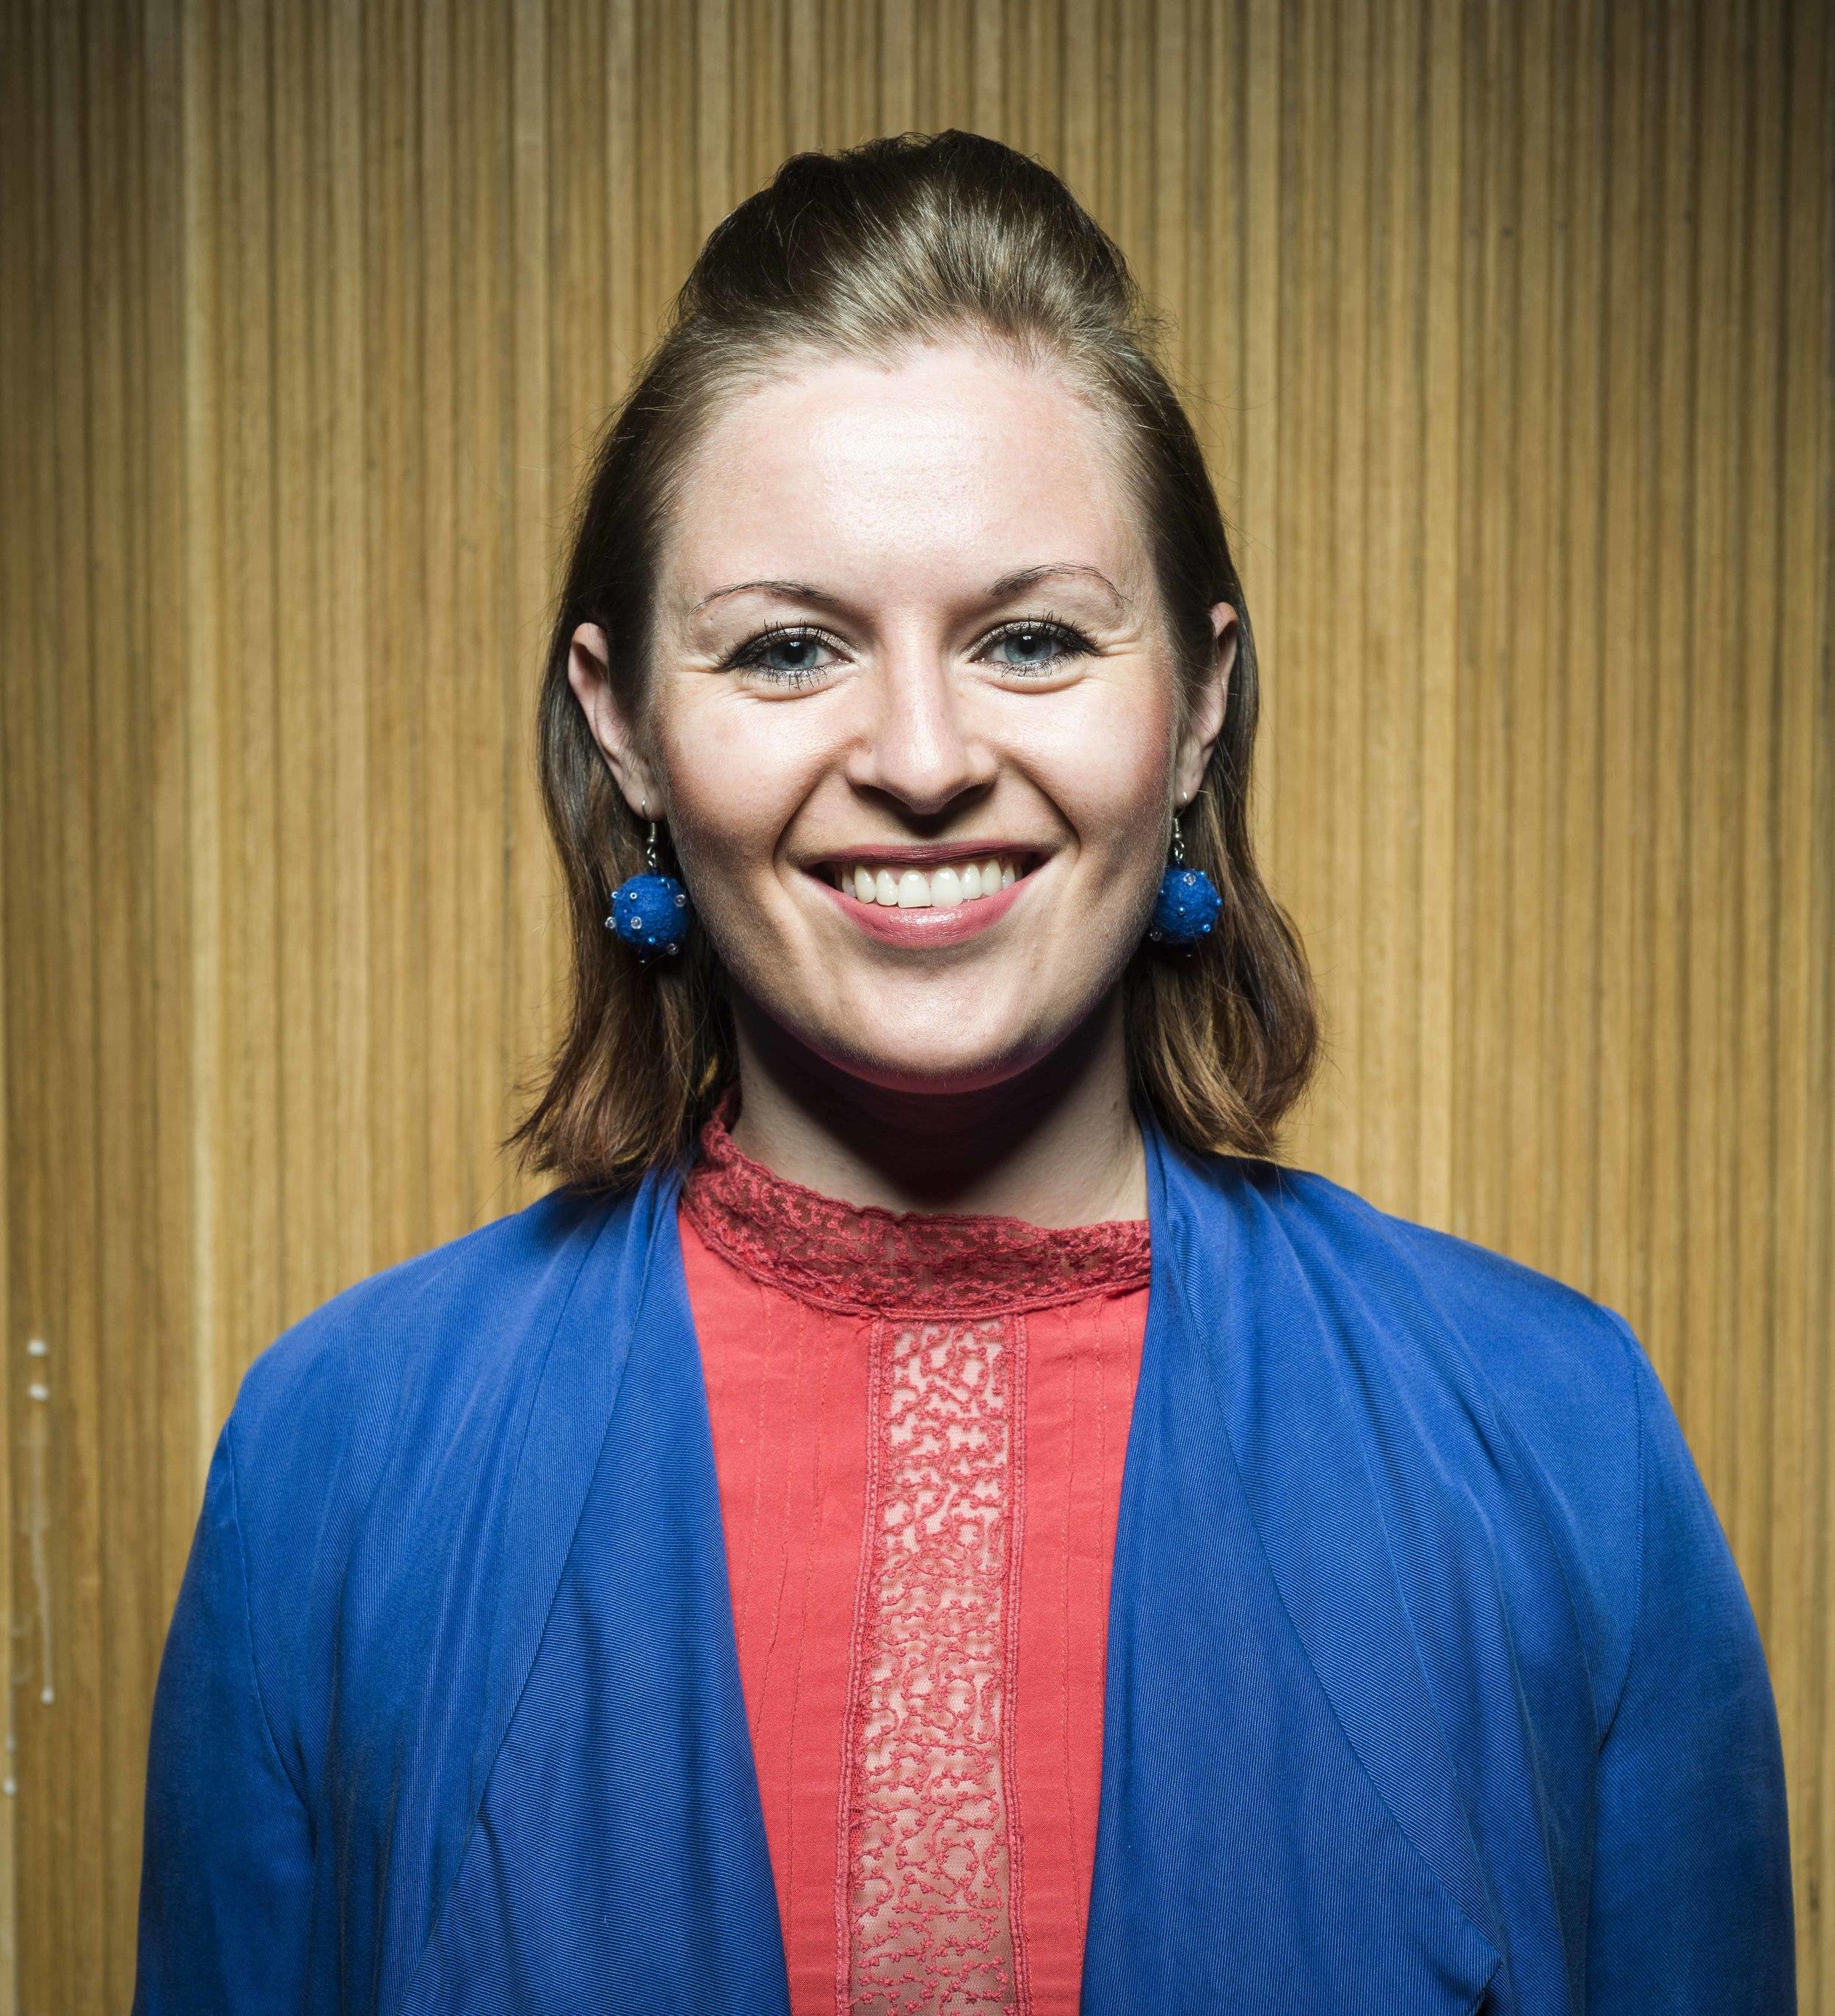 Liene Klava – Viola - Photo: Thor Brødreskift